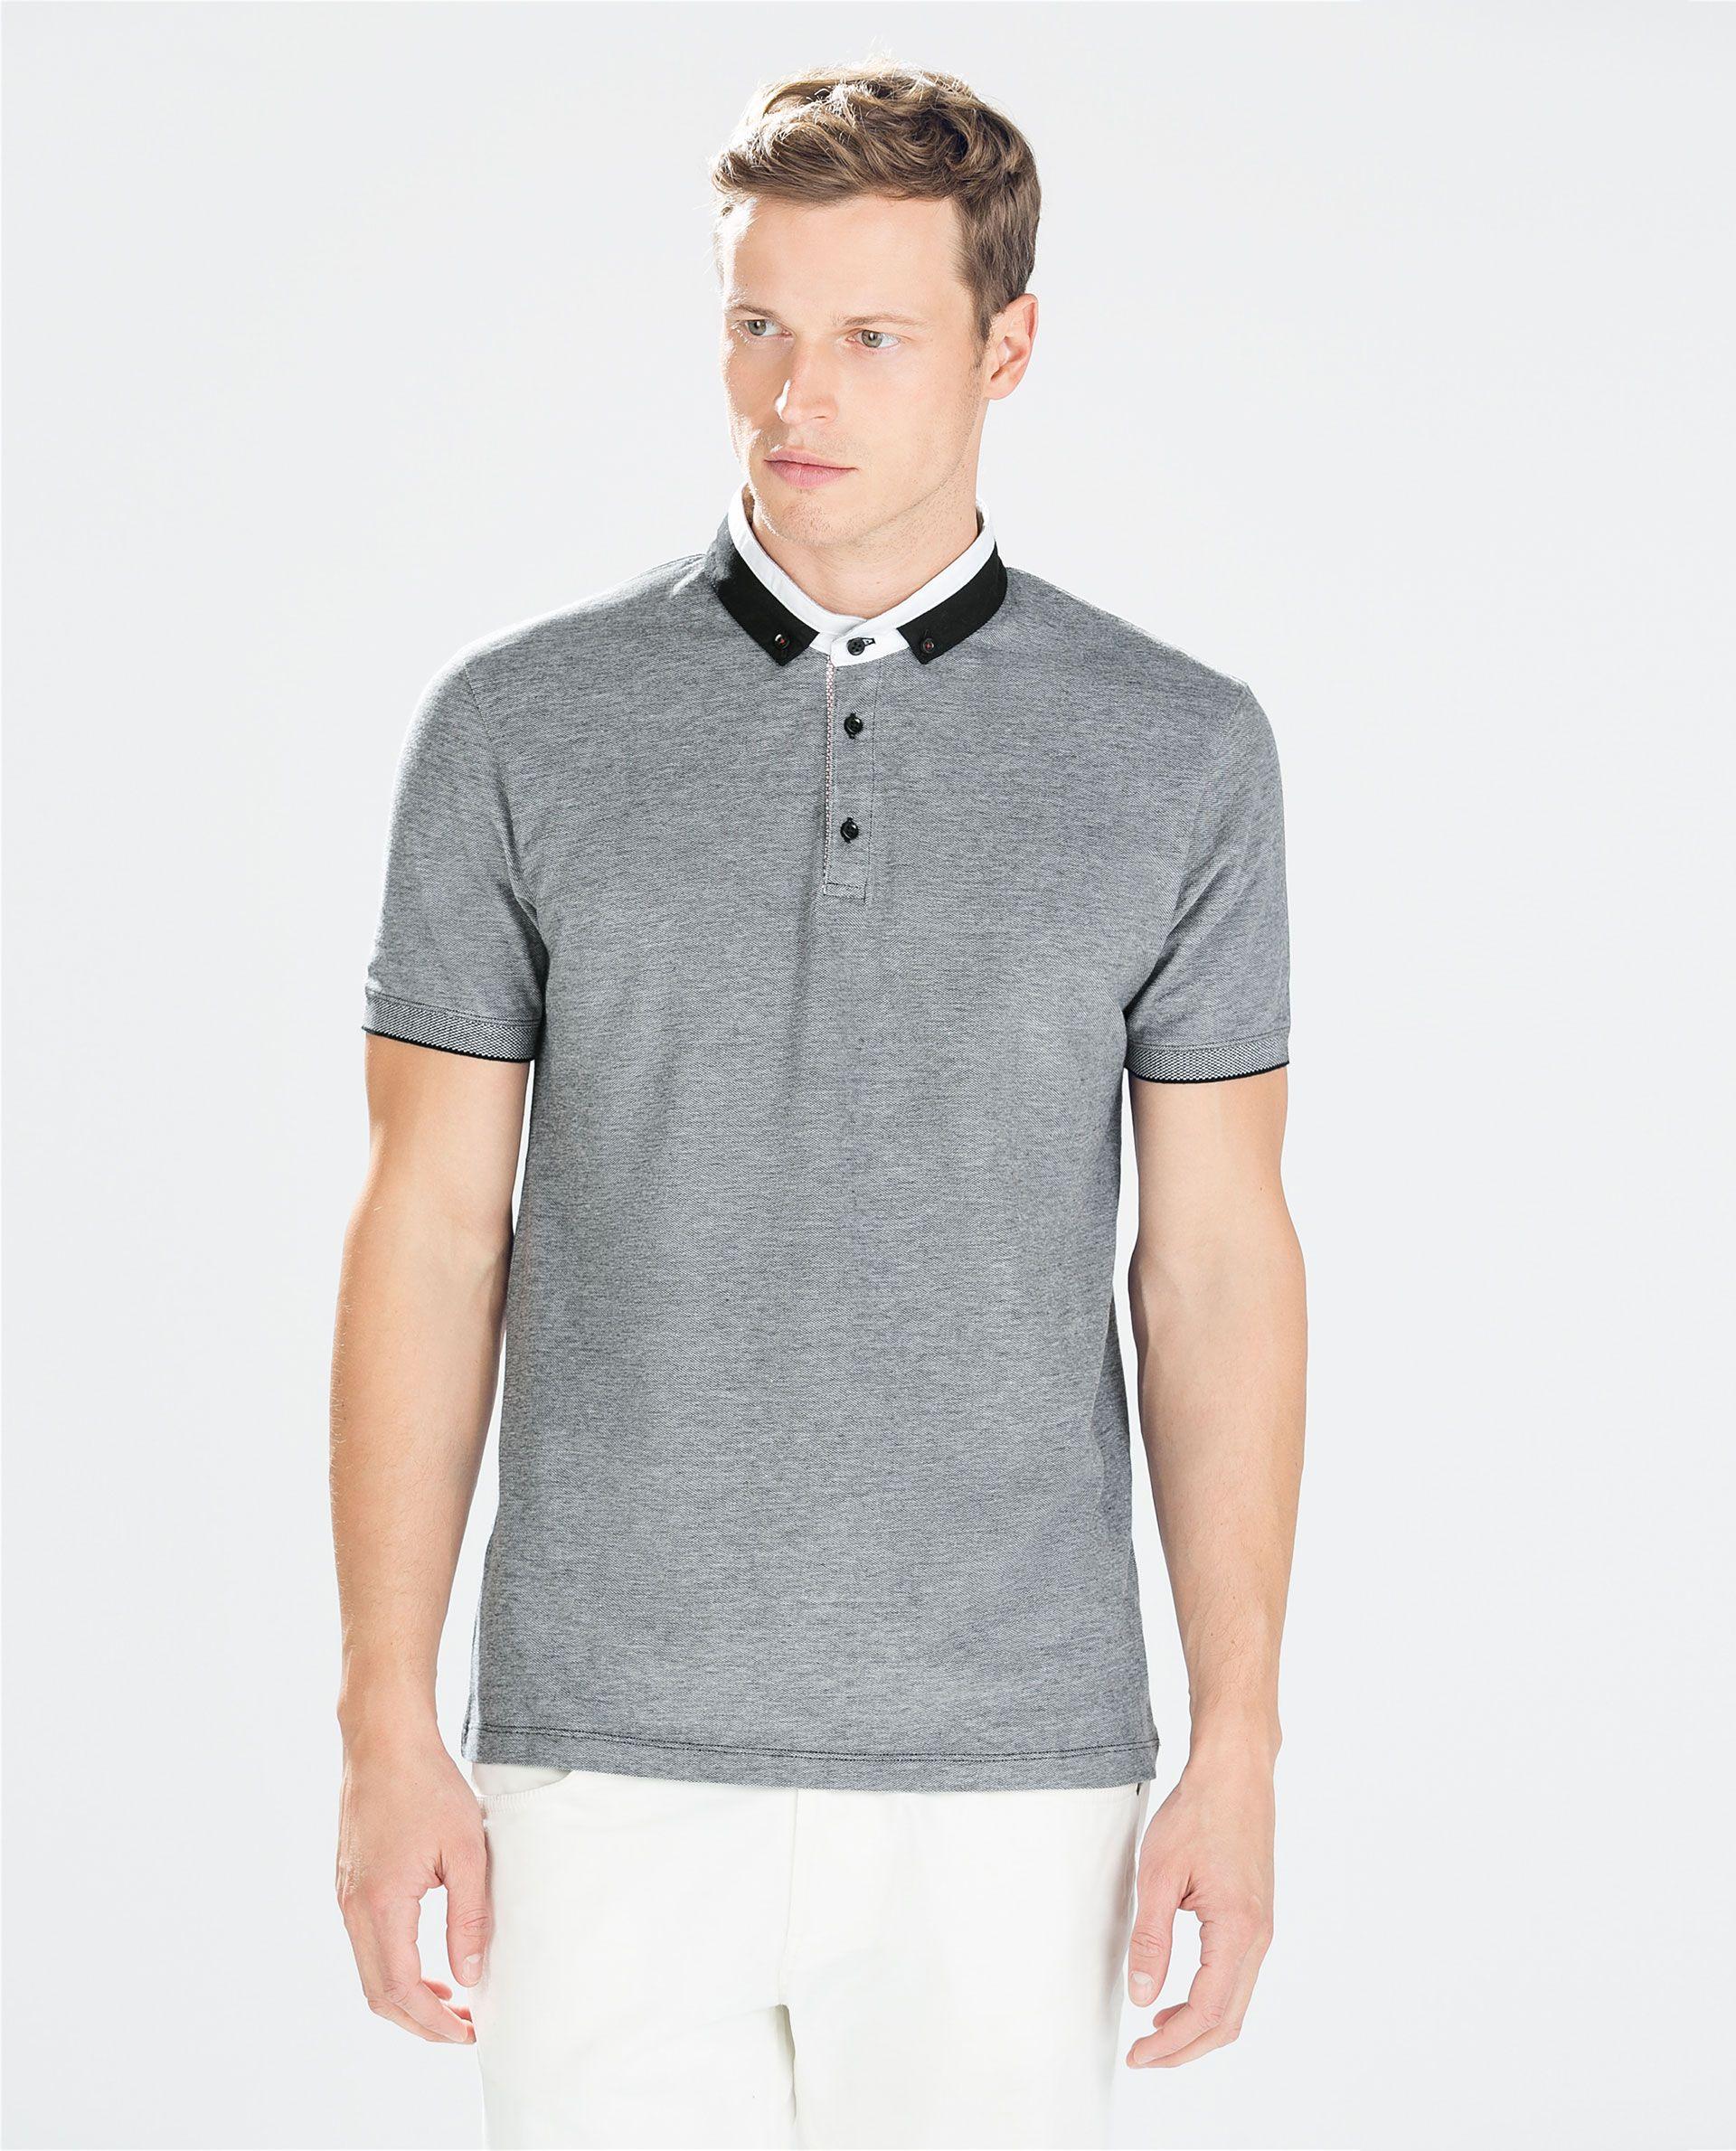 SHORT SLEEVE POLO SHIRT - Polo shirts - T - shirts - MAN | ZARA Turkey